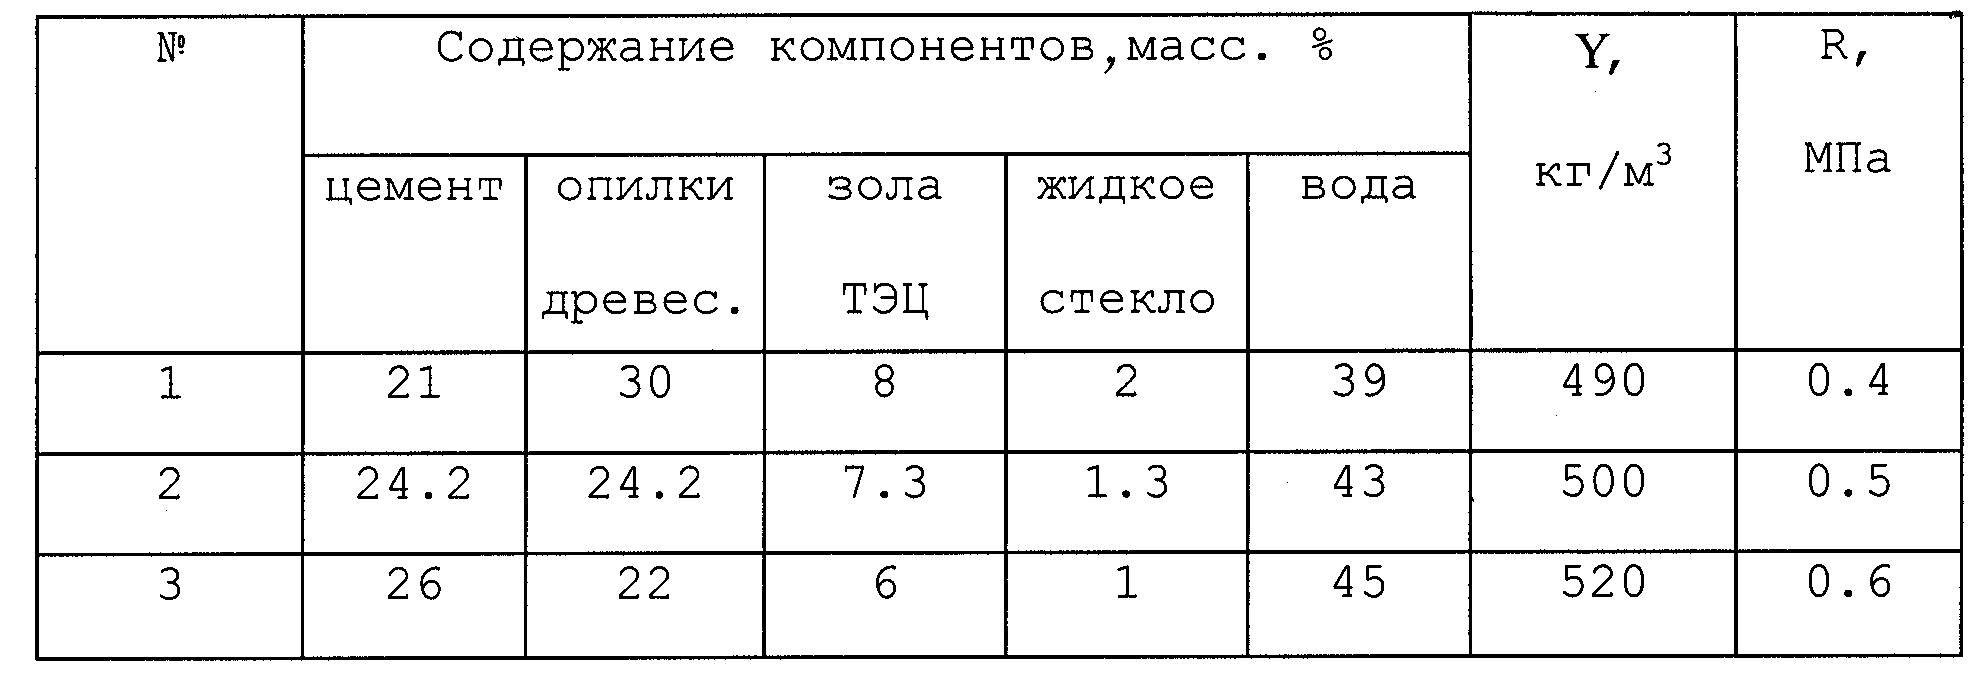 стружкобетон пропорции компонентов